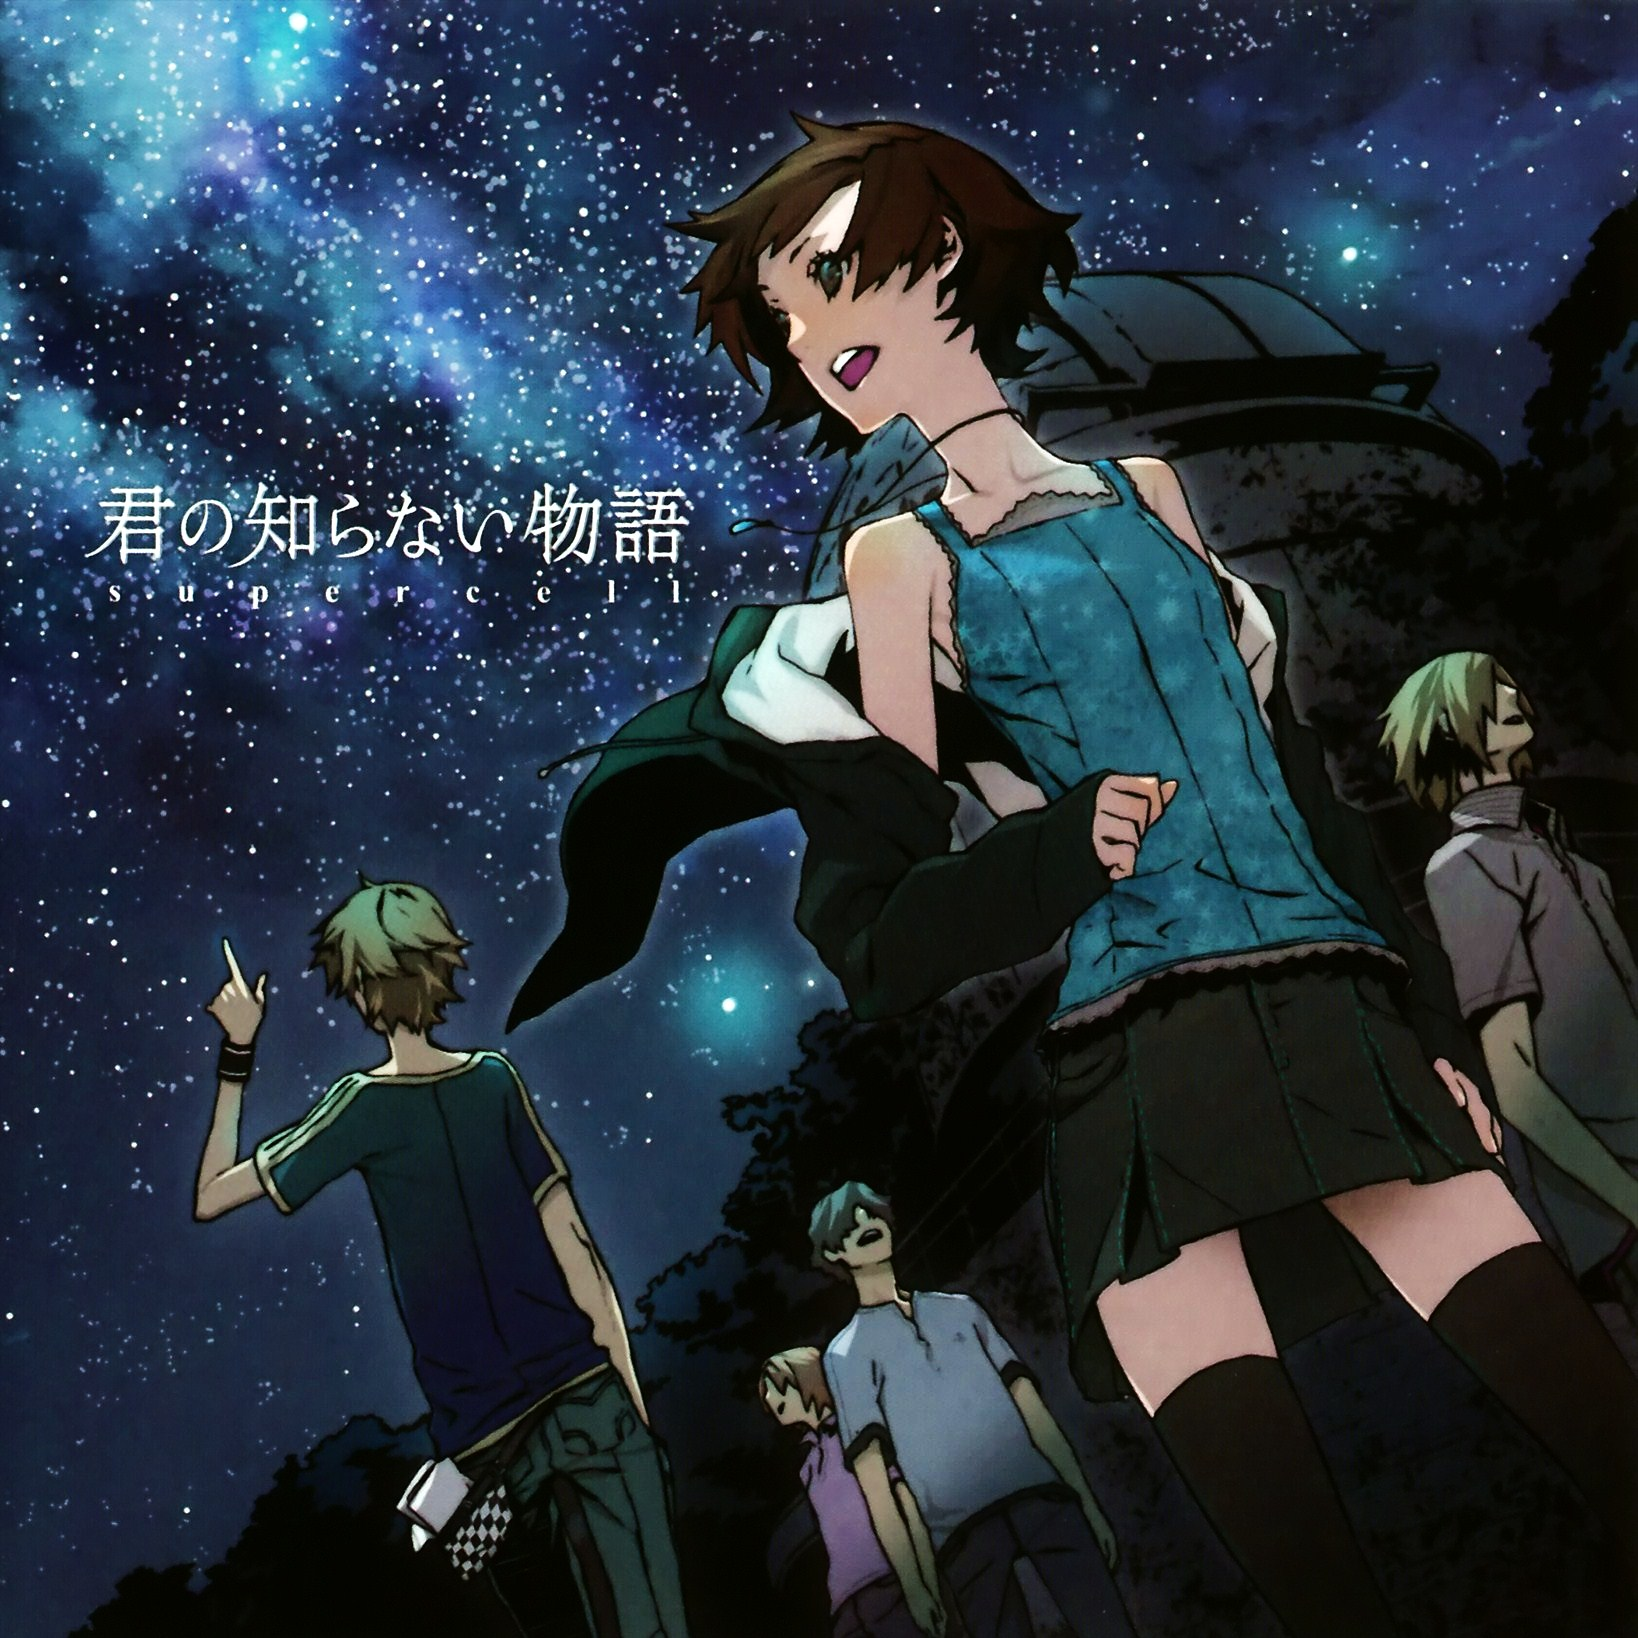 http://blog.animeinstrumentality.net/wp-content/uploads/2010/04/Bakemonogatari-ED.jpg